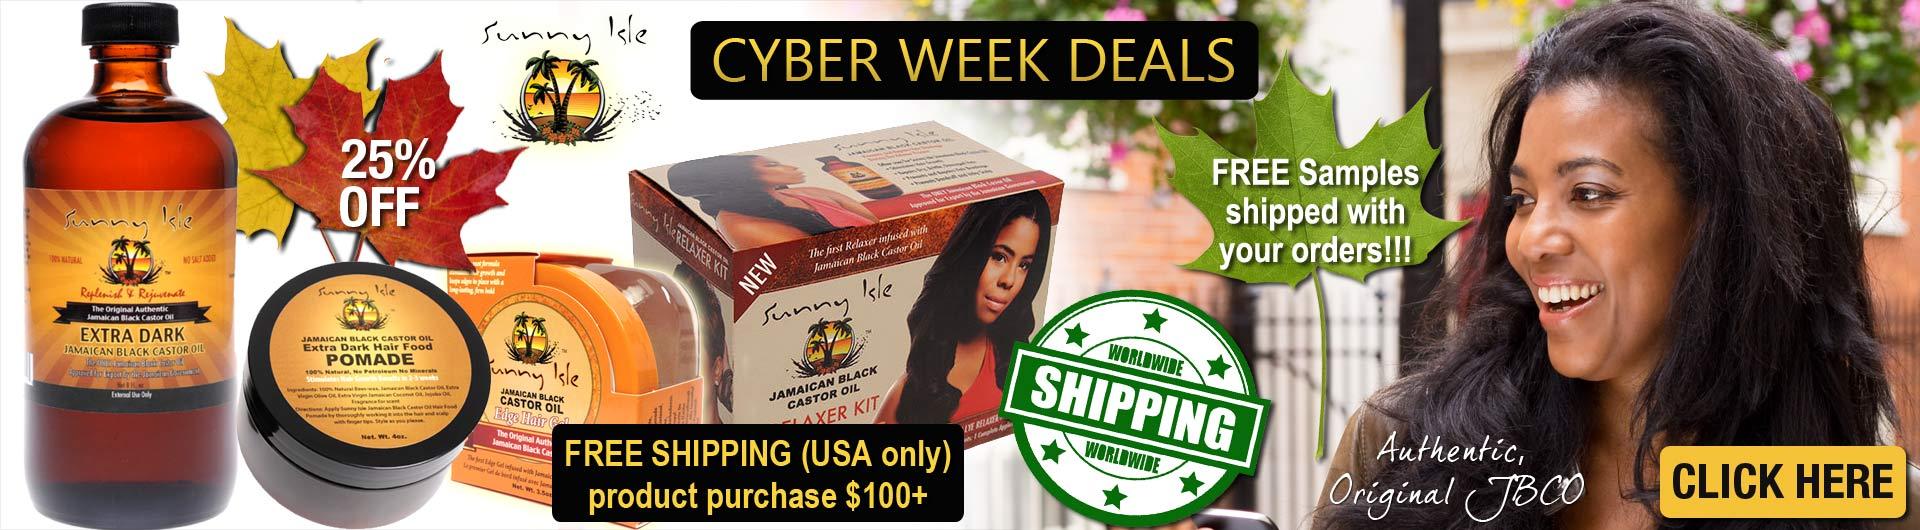 Sunny Isle Cyber Deals at JamaicanOils